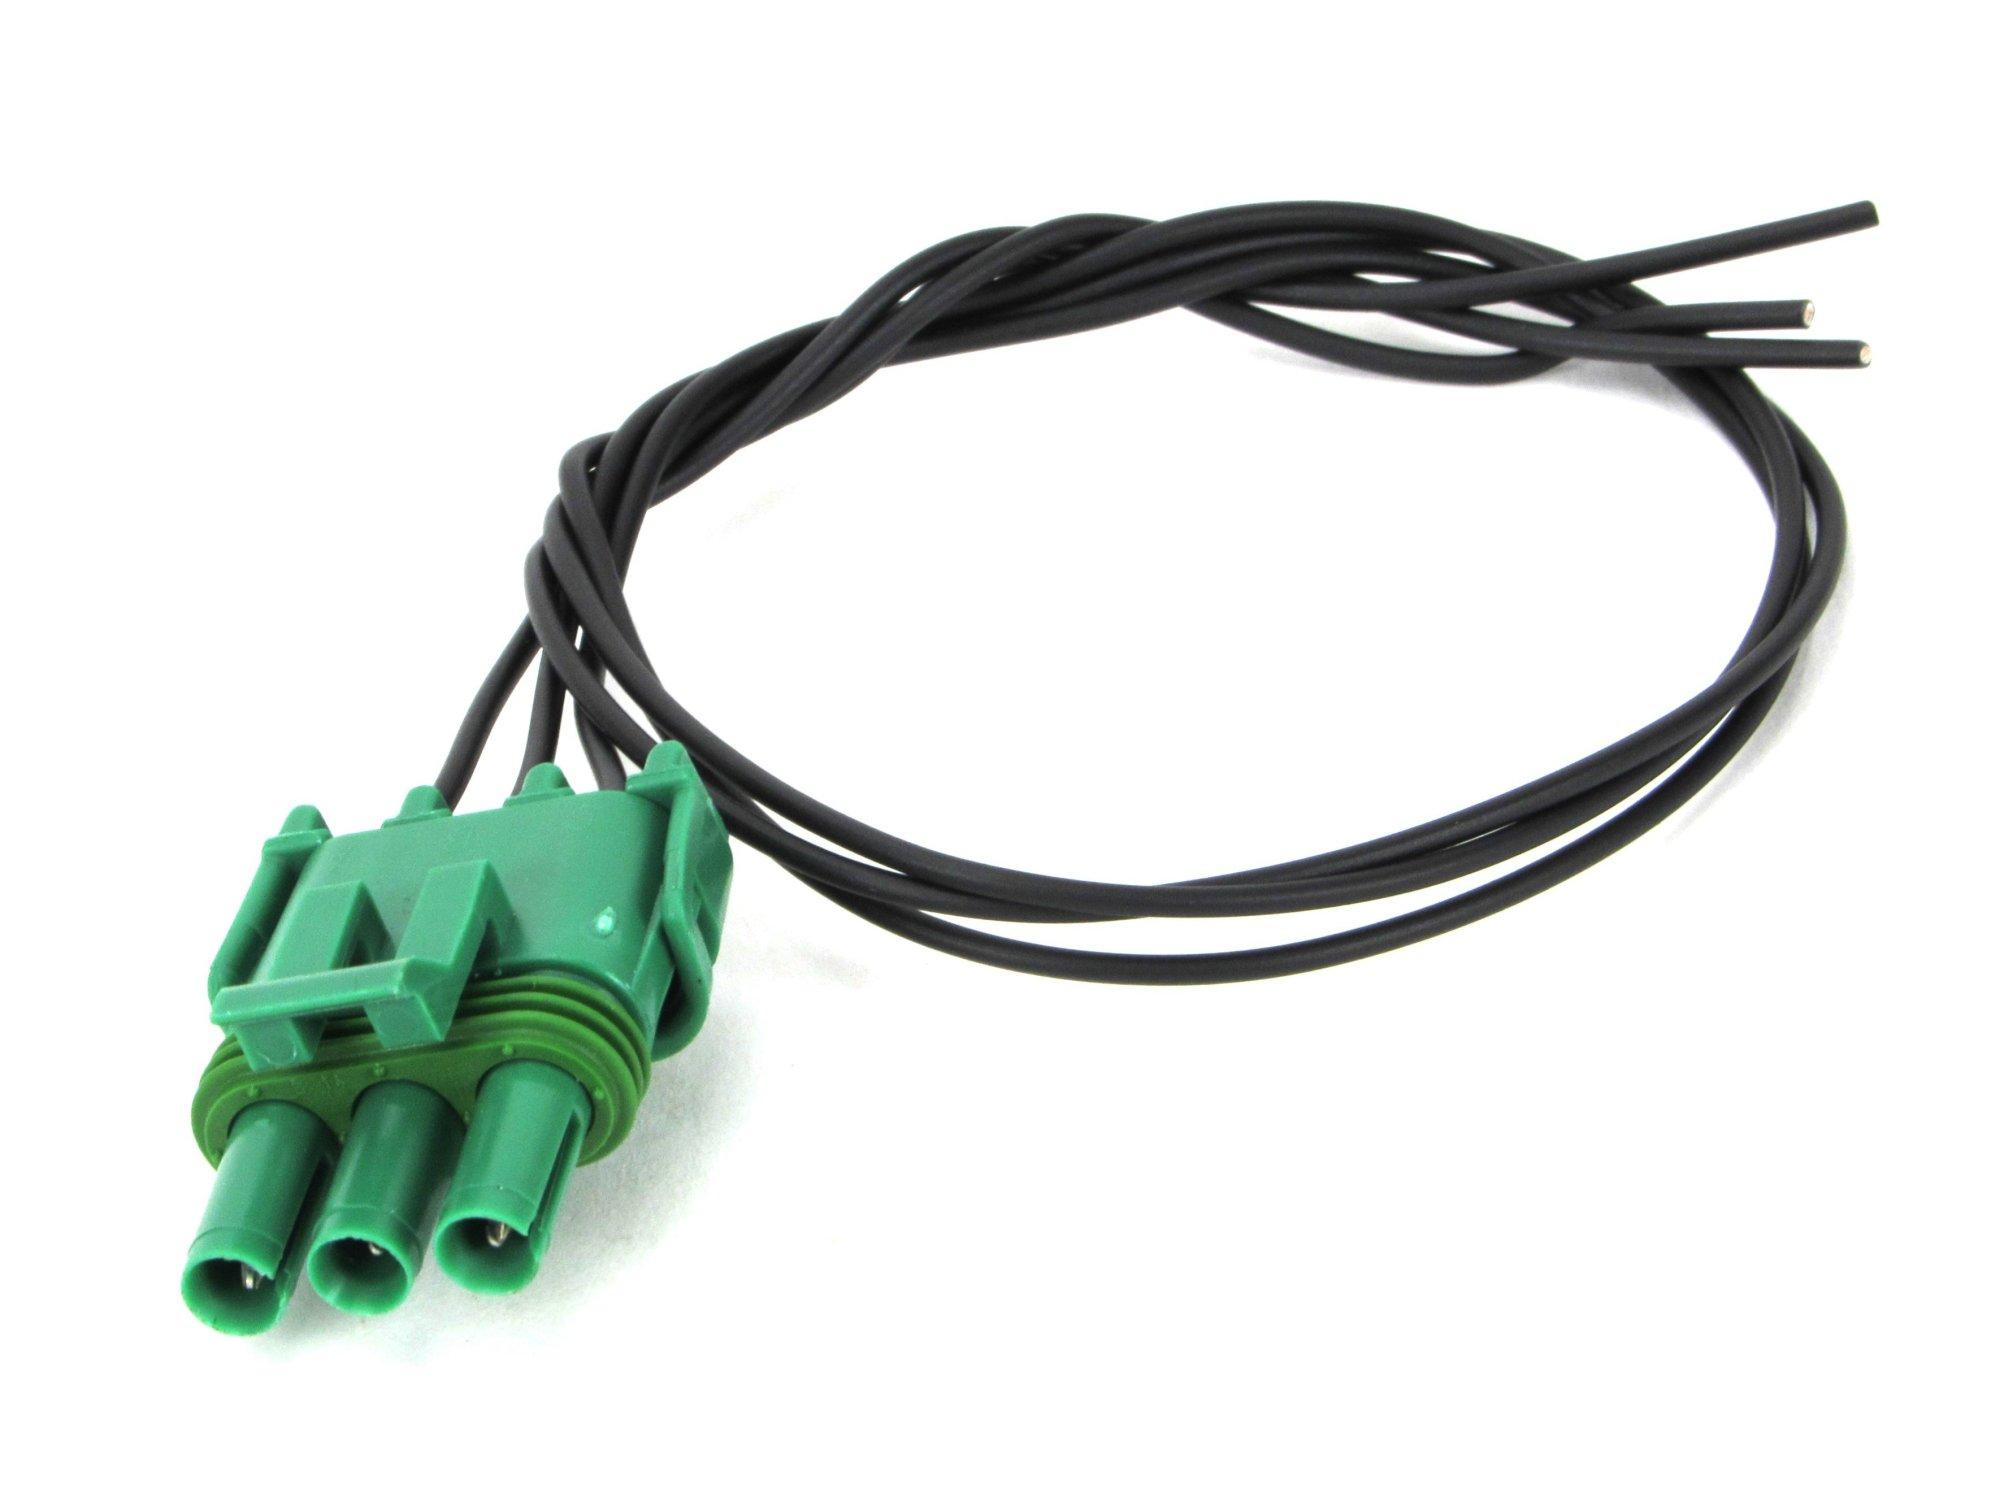 hight resolution of  wiring diagram map sensor free ls3 ls7 2 5 bar map sensor connector lsx swap harness